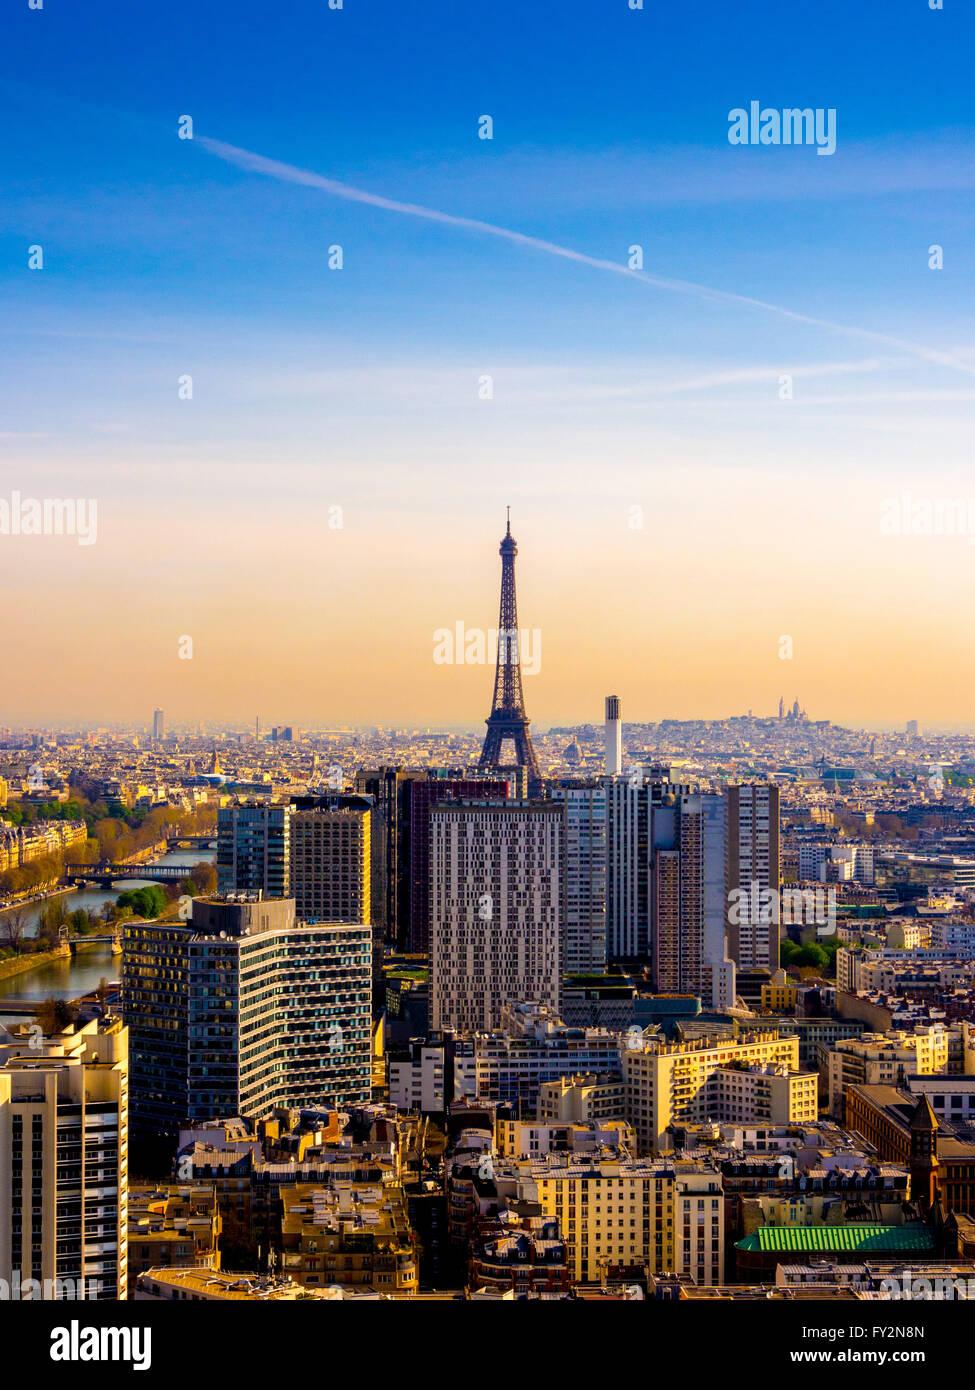 Eiffelturm, Paris, Frankreich, am frühen Morgen. Stockbild